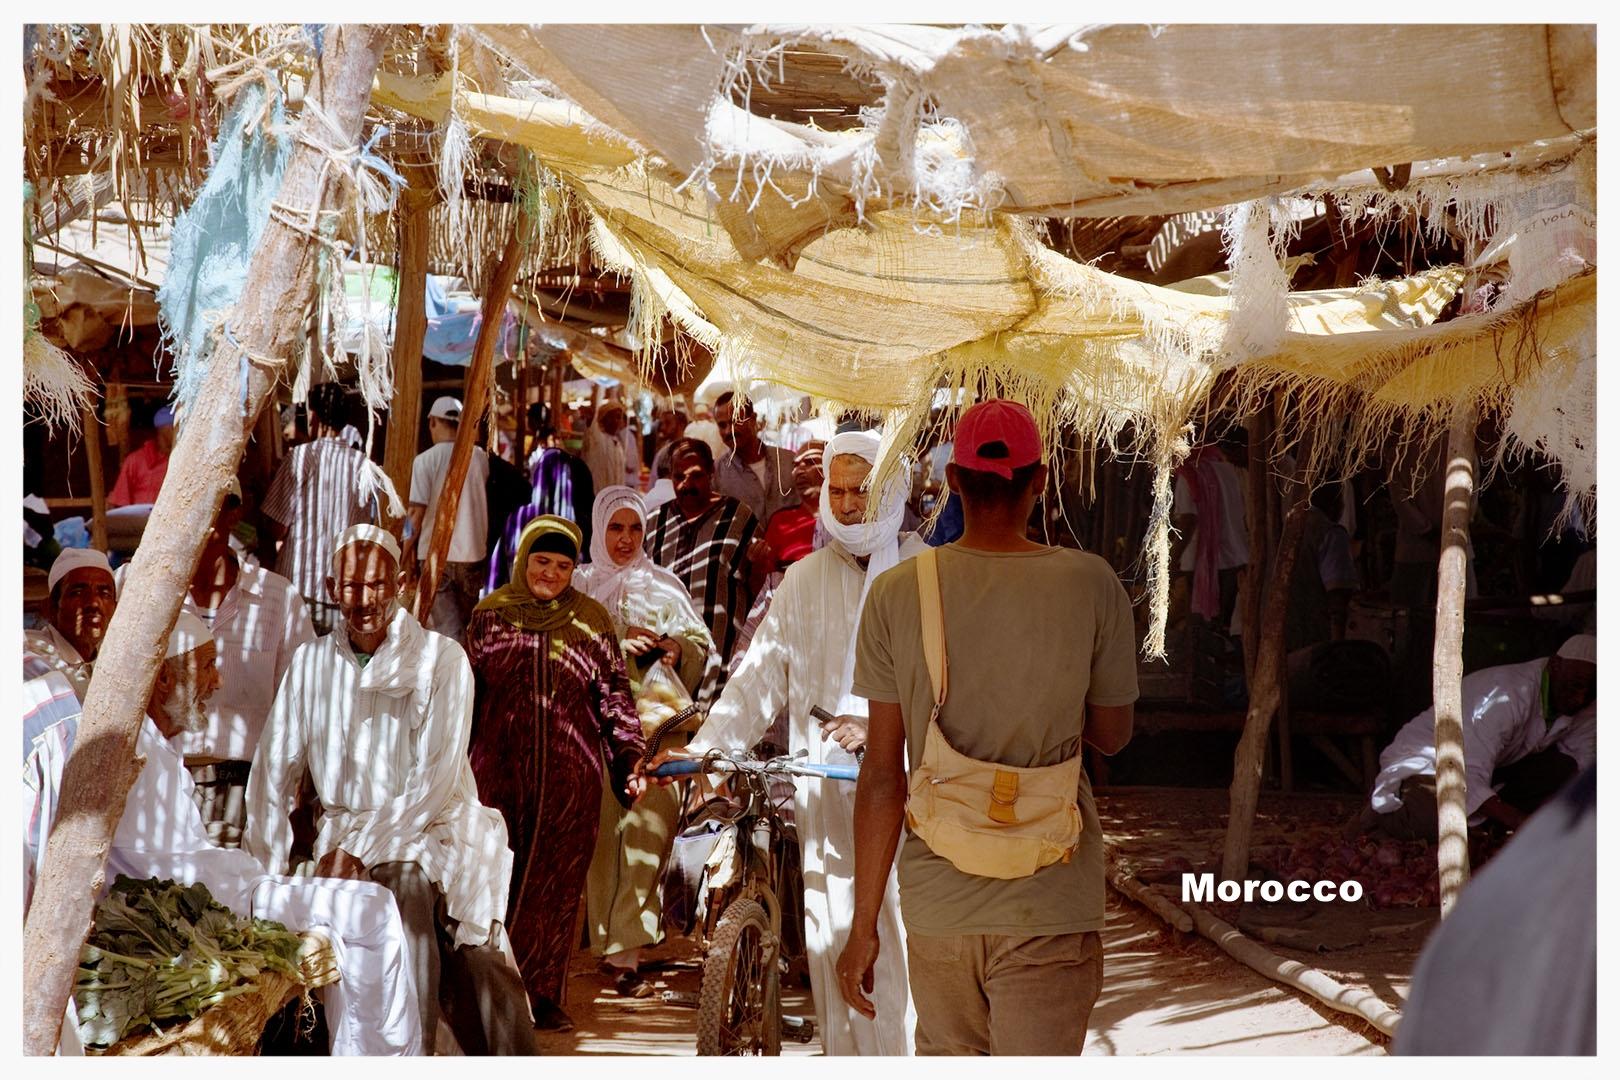 Click hereto view Morocco